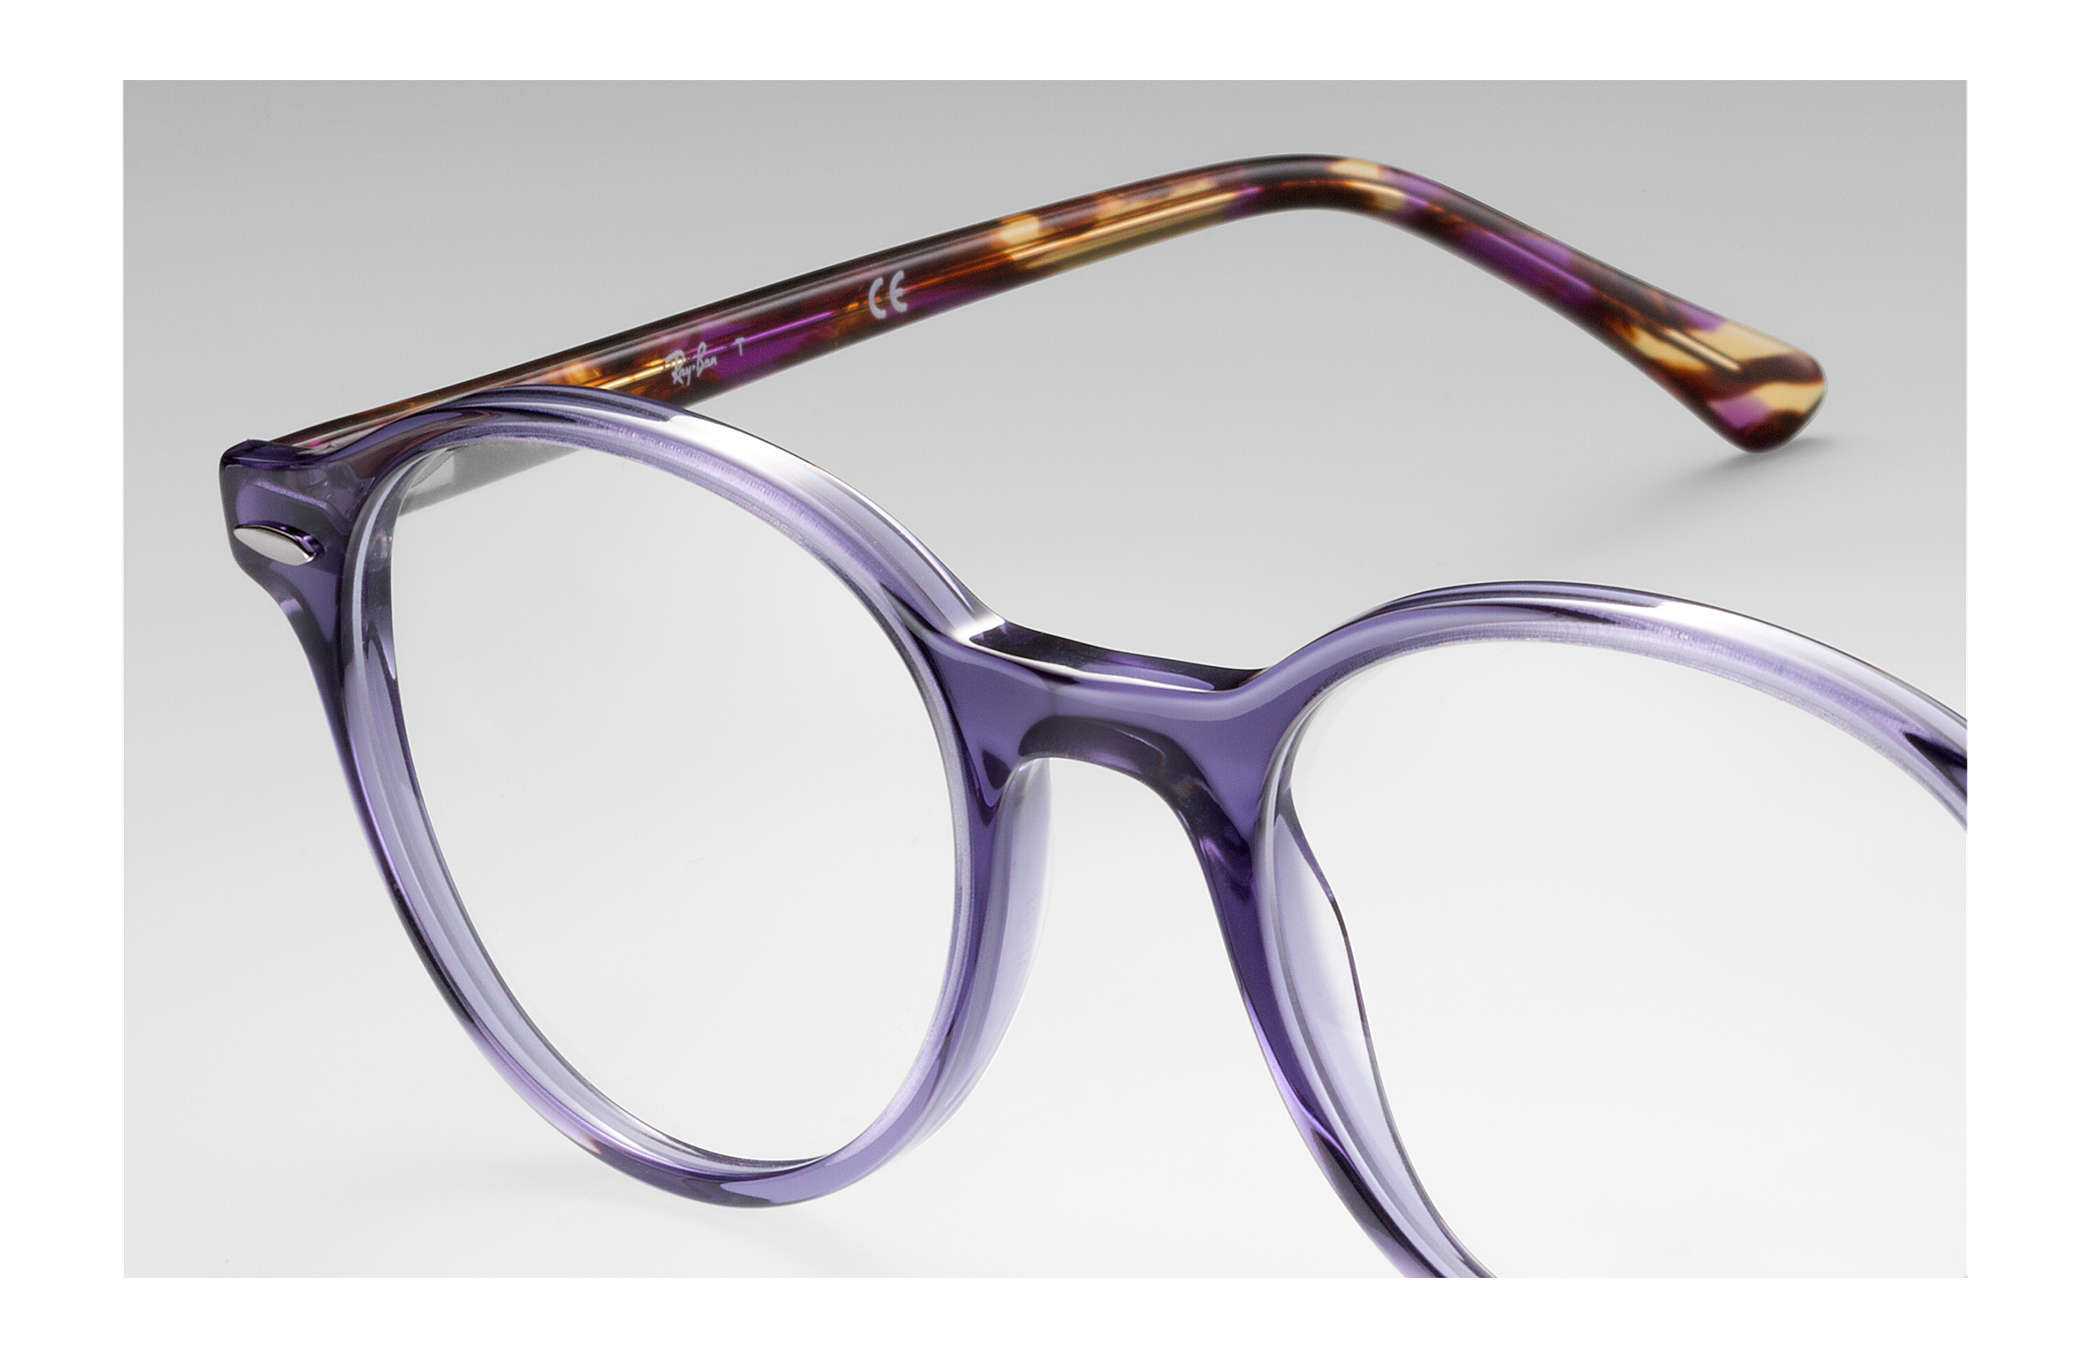 a195eb9b40b06 Ray-Ban prescription glasses Dean RB7118 Violet - Propionate ...